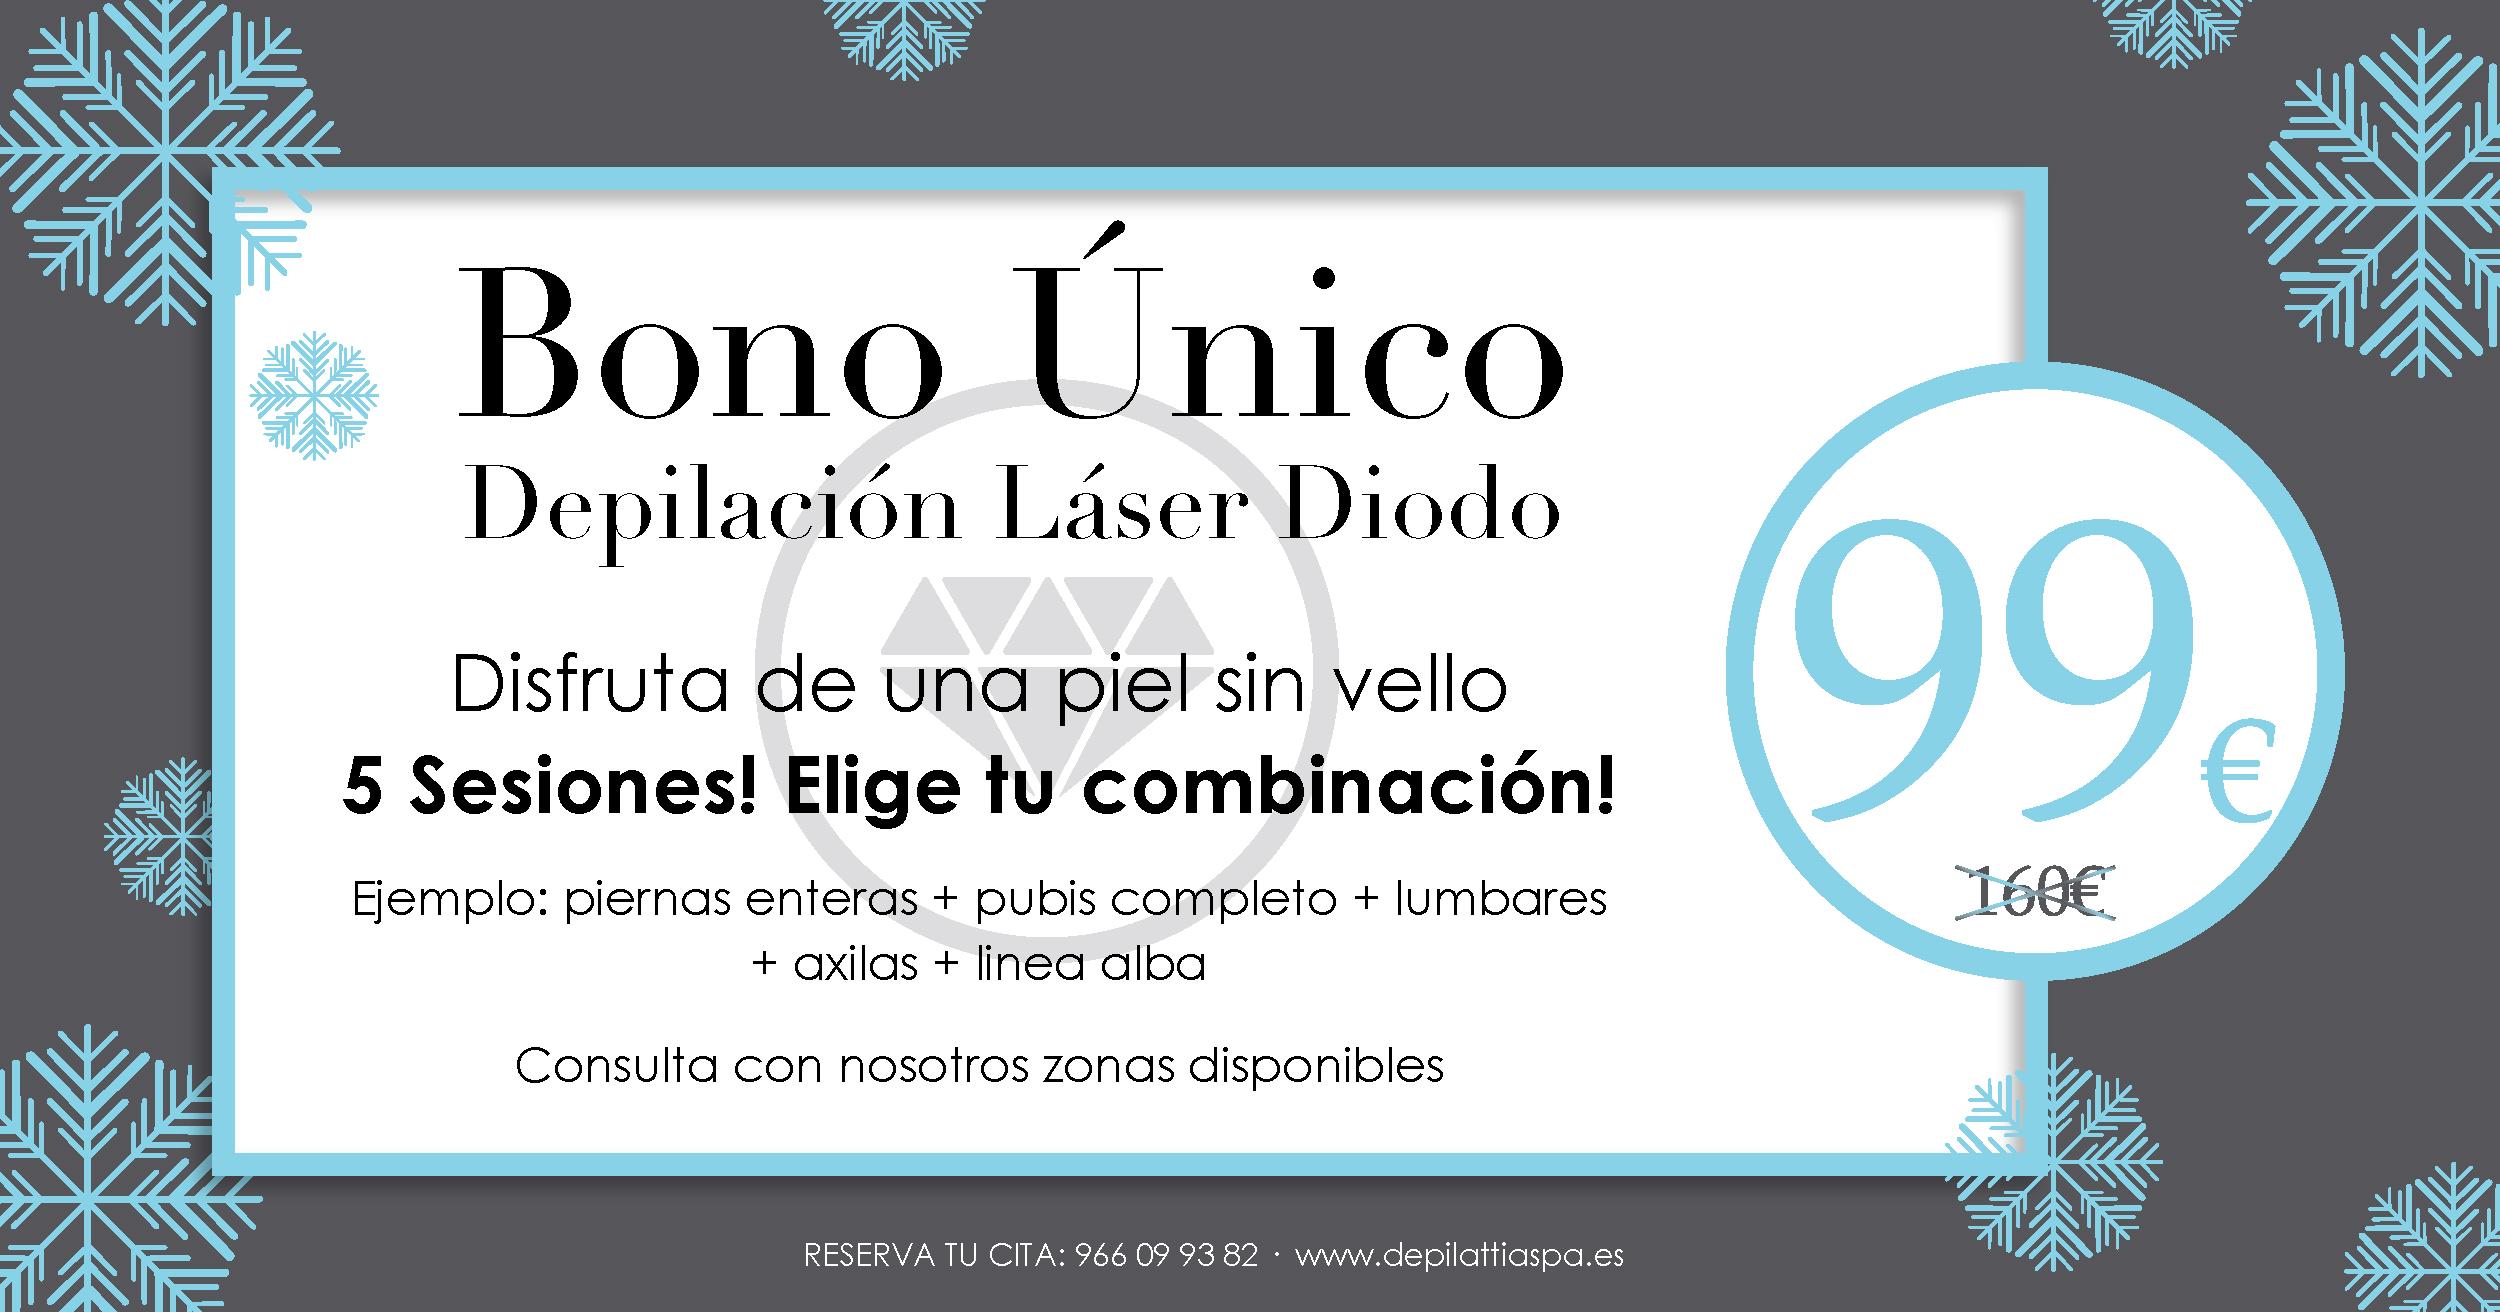 bono-unico-depilattia-spa-elche-2_Facebook-post